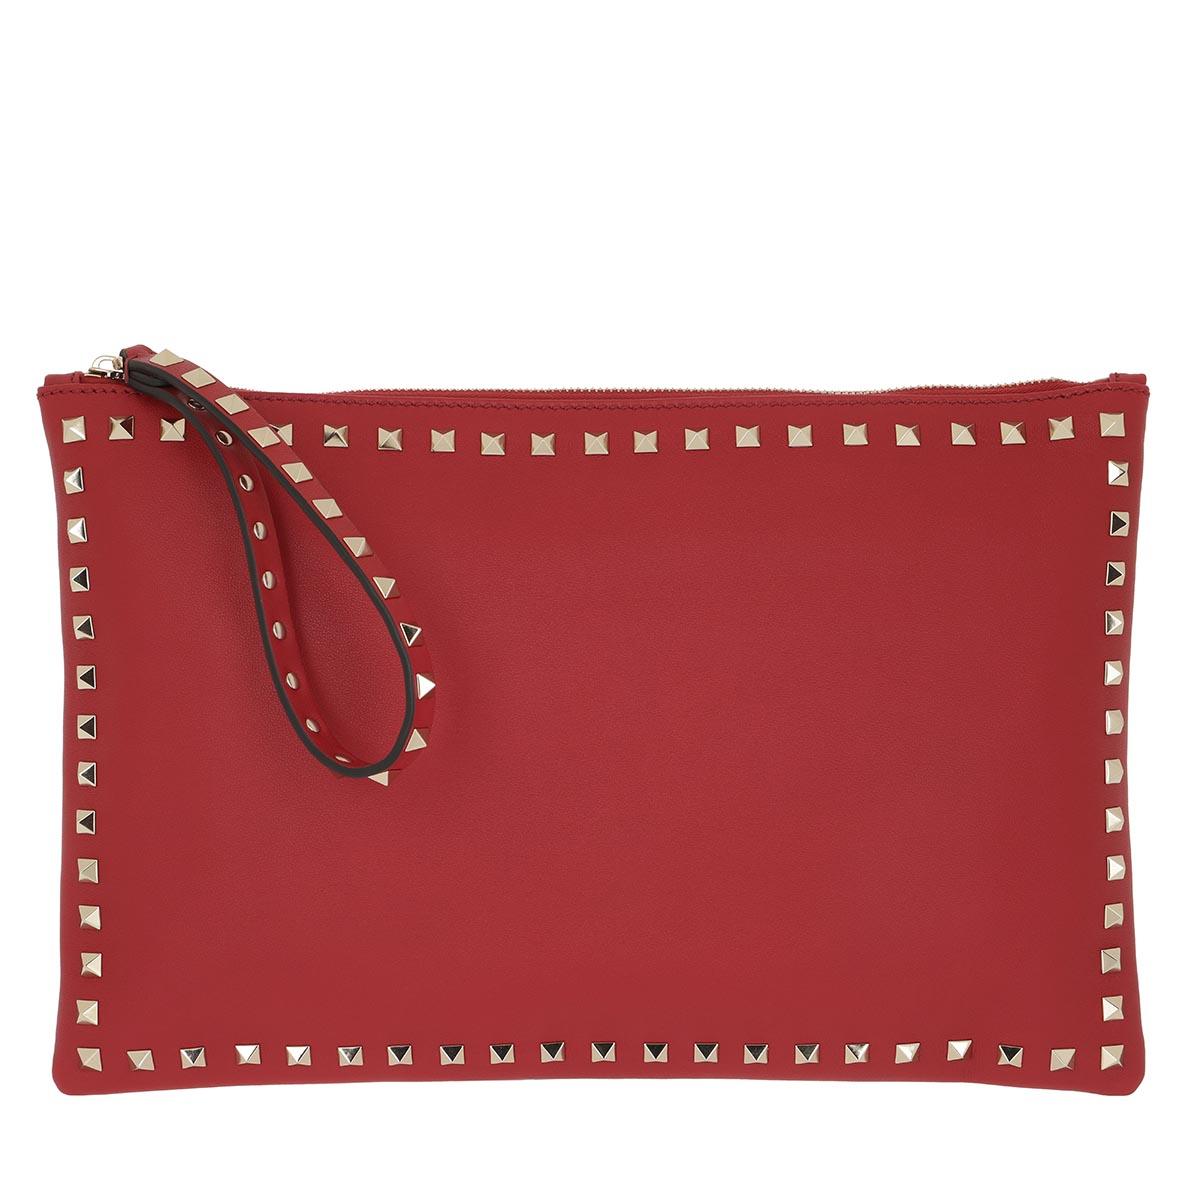 Valentino Clutch - Rockstud Clutch Small Rosso - in rot - für Damen